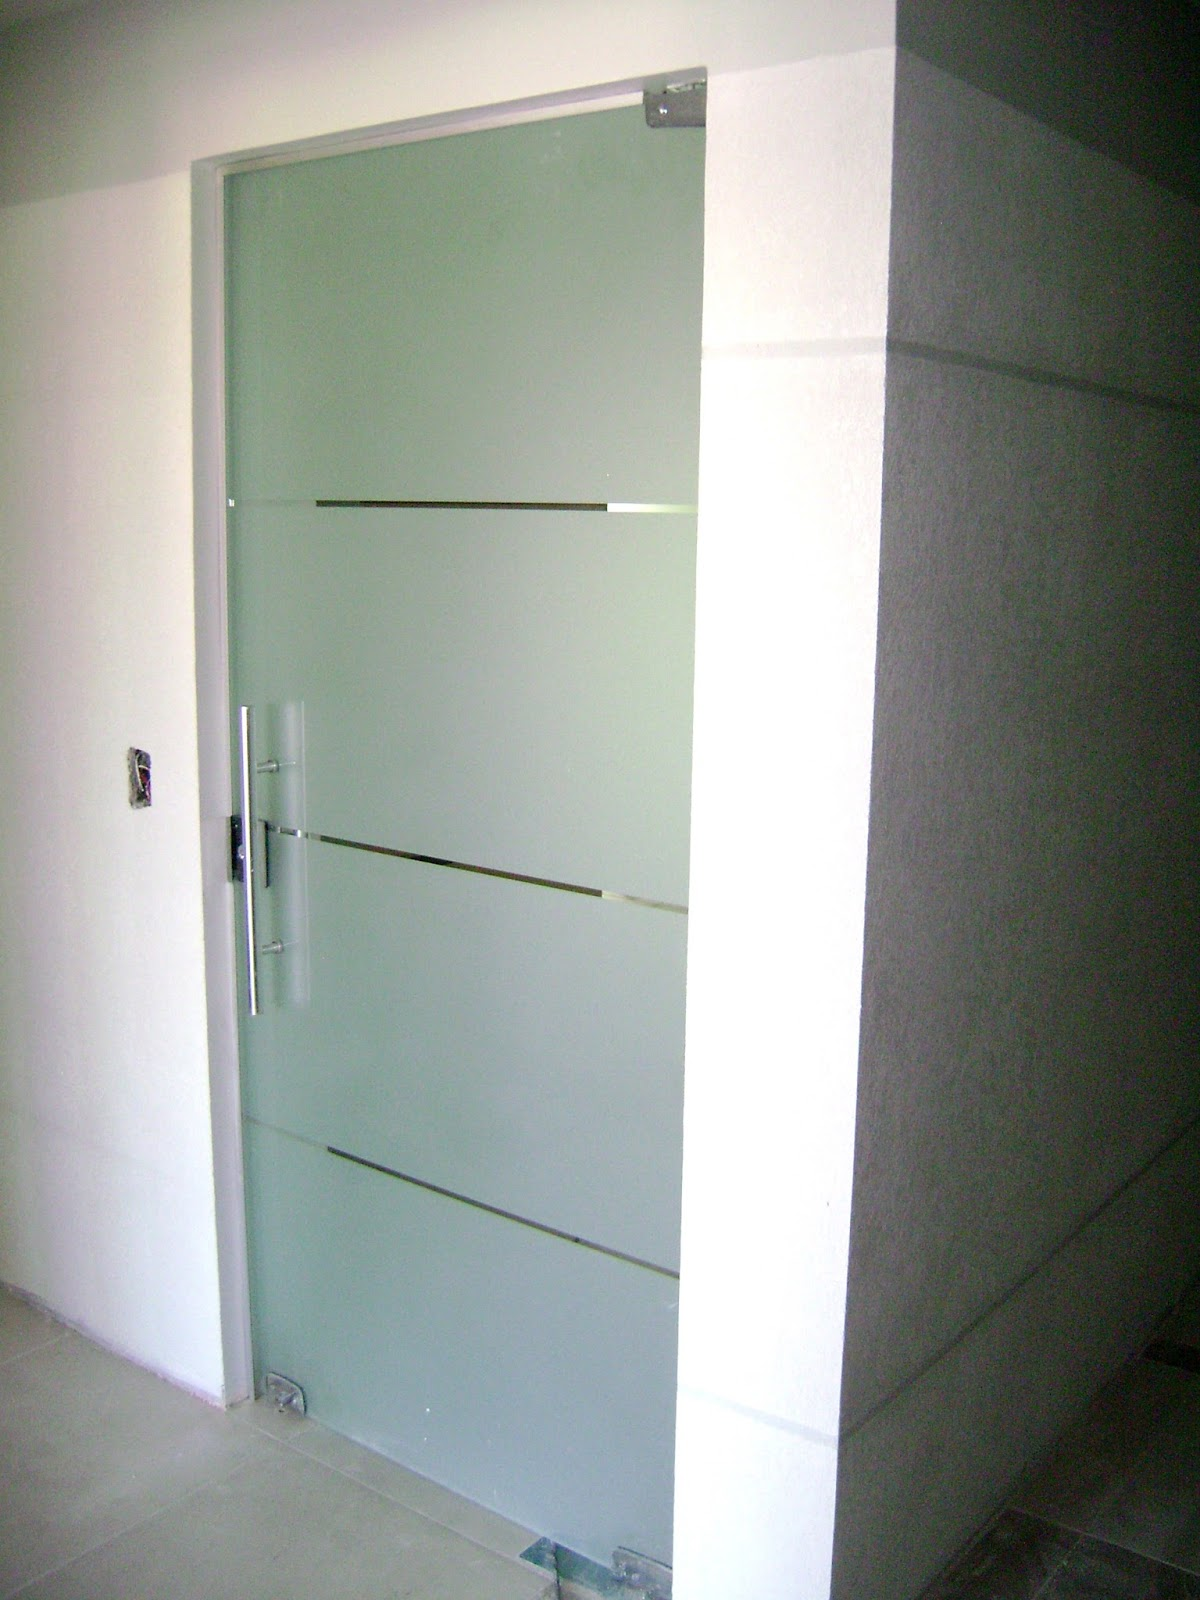 Imagens de #576874  vidro temperado Incolor 08 mm Jato fosco com listas e puxador tubular 1200x1600 px 3510 Blindex Fosco Banheiro